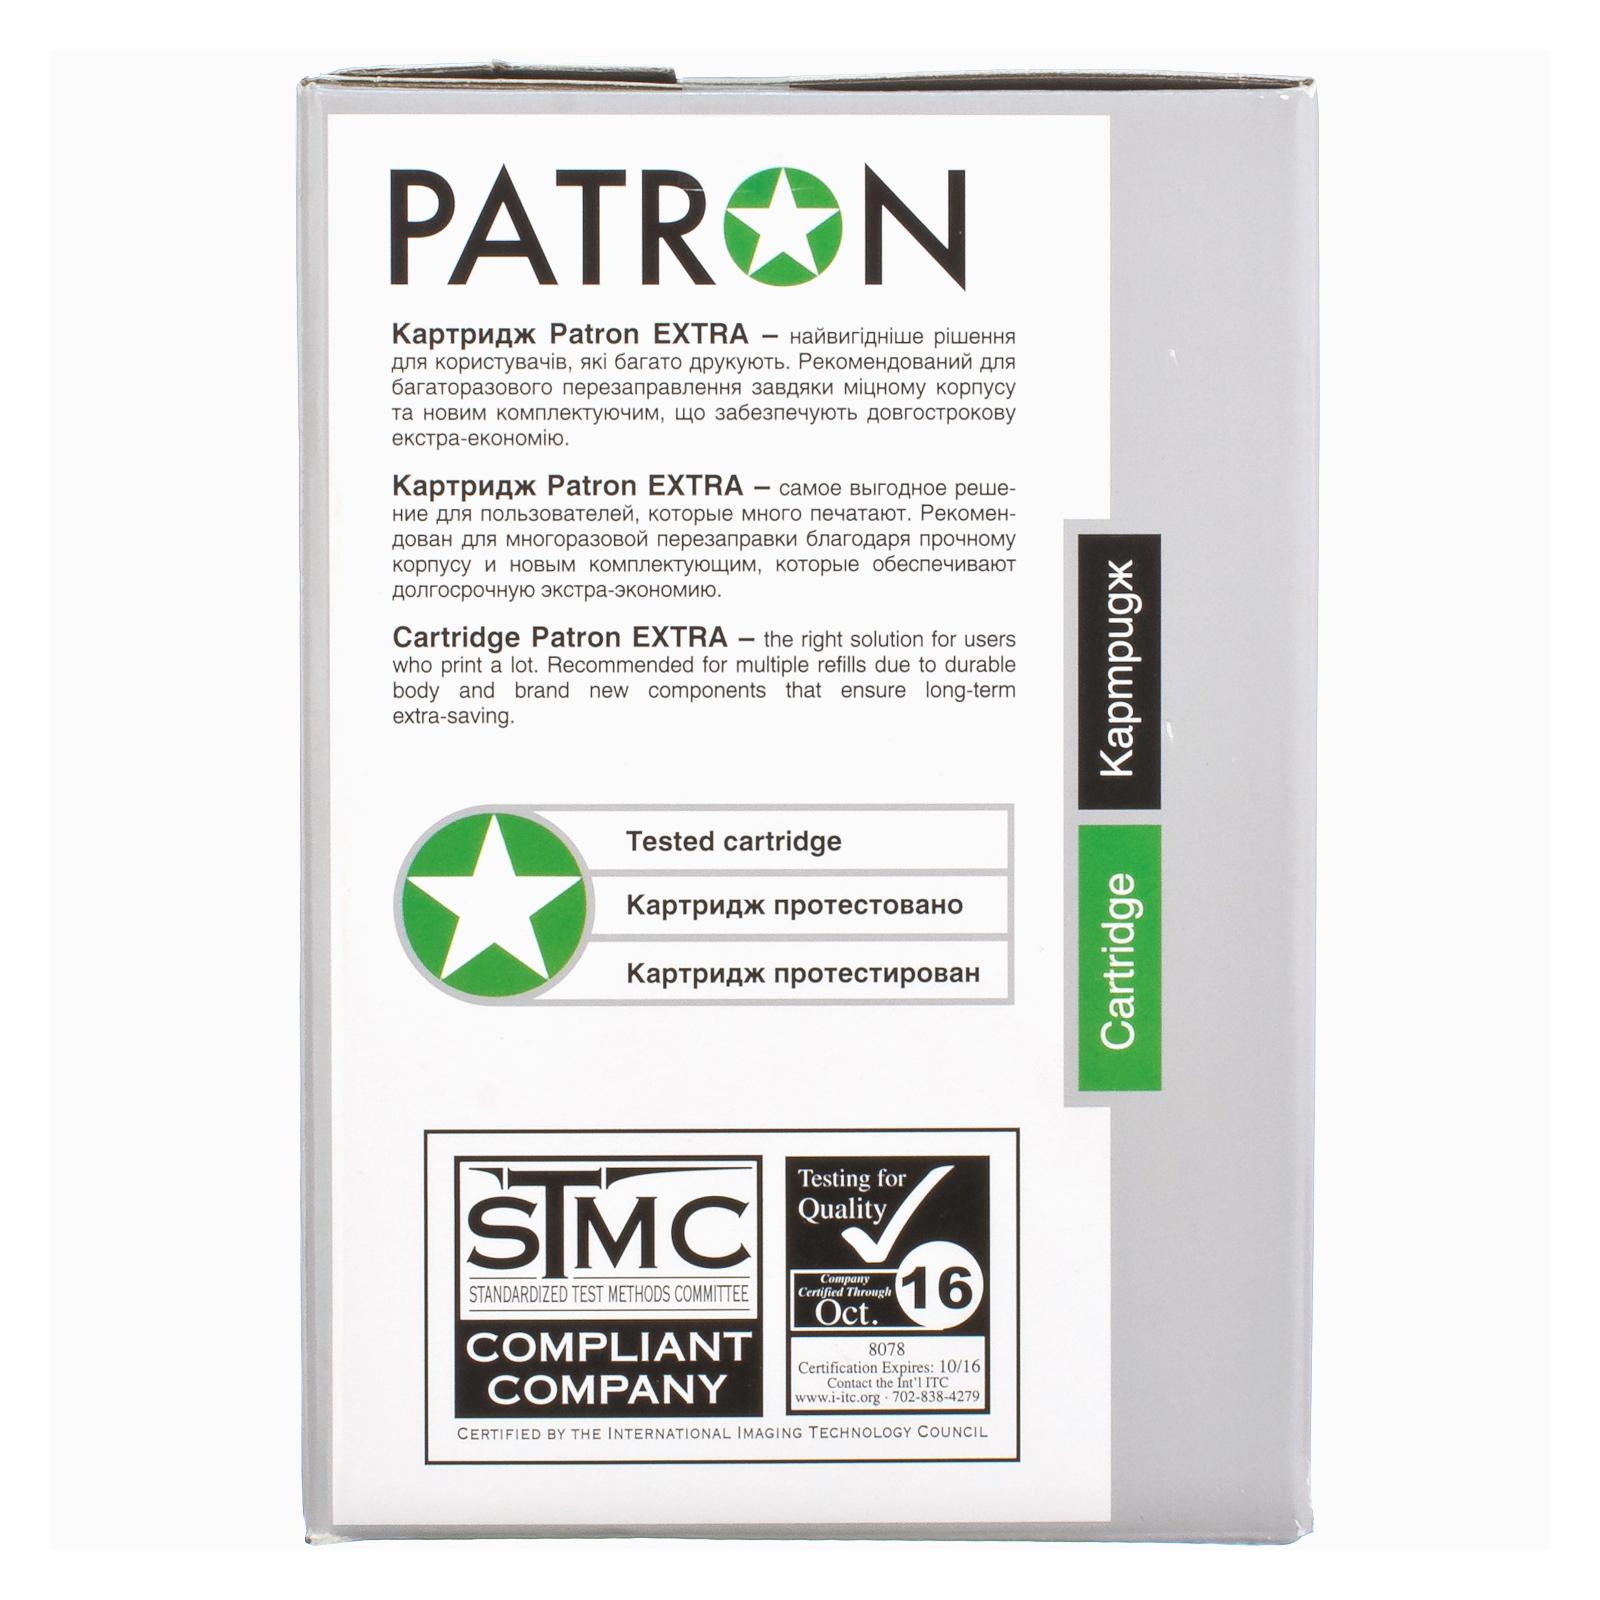 Картридж PATRON HP CLJ CP1215/ CP1515 (PN-125AYR) YELLOW Extra (CT-HP-CB542A-Y-PN-R) изображение 6